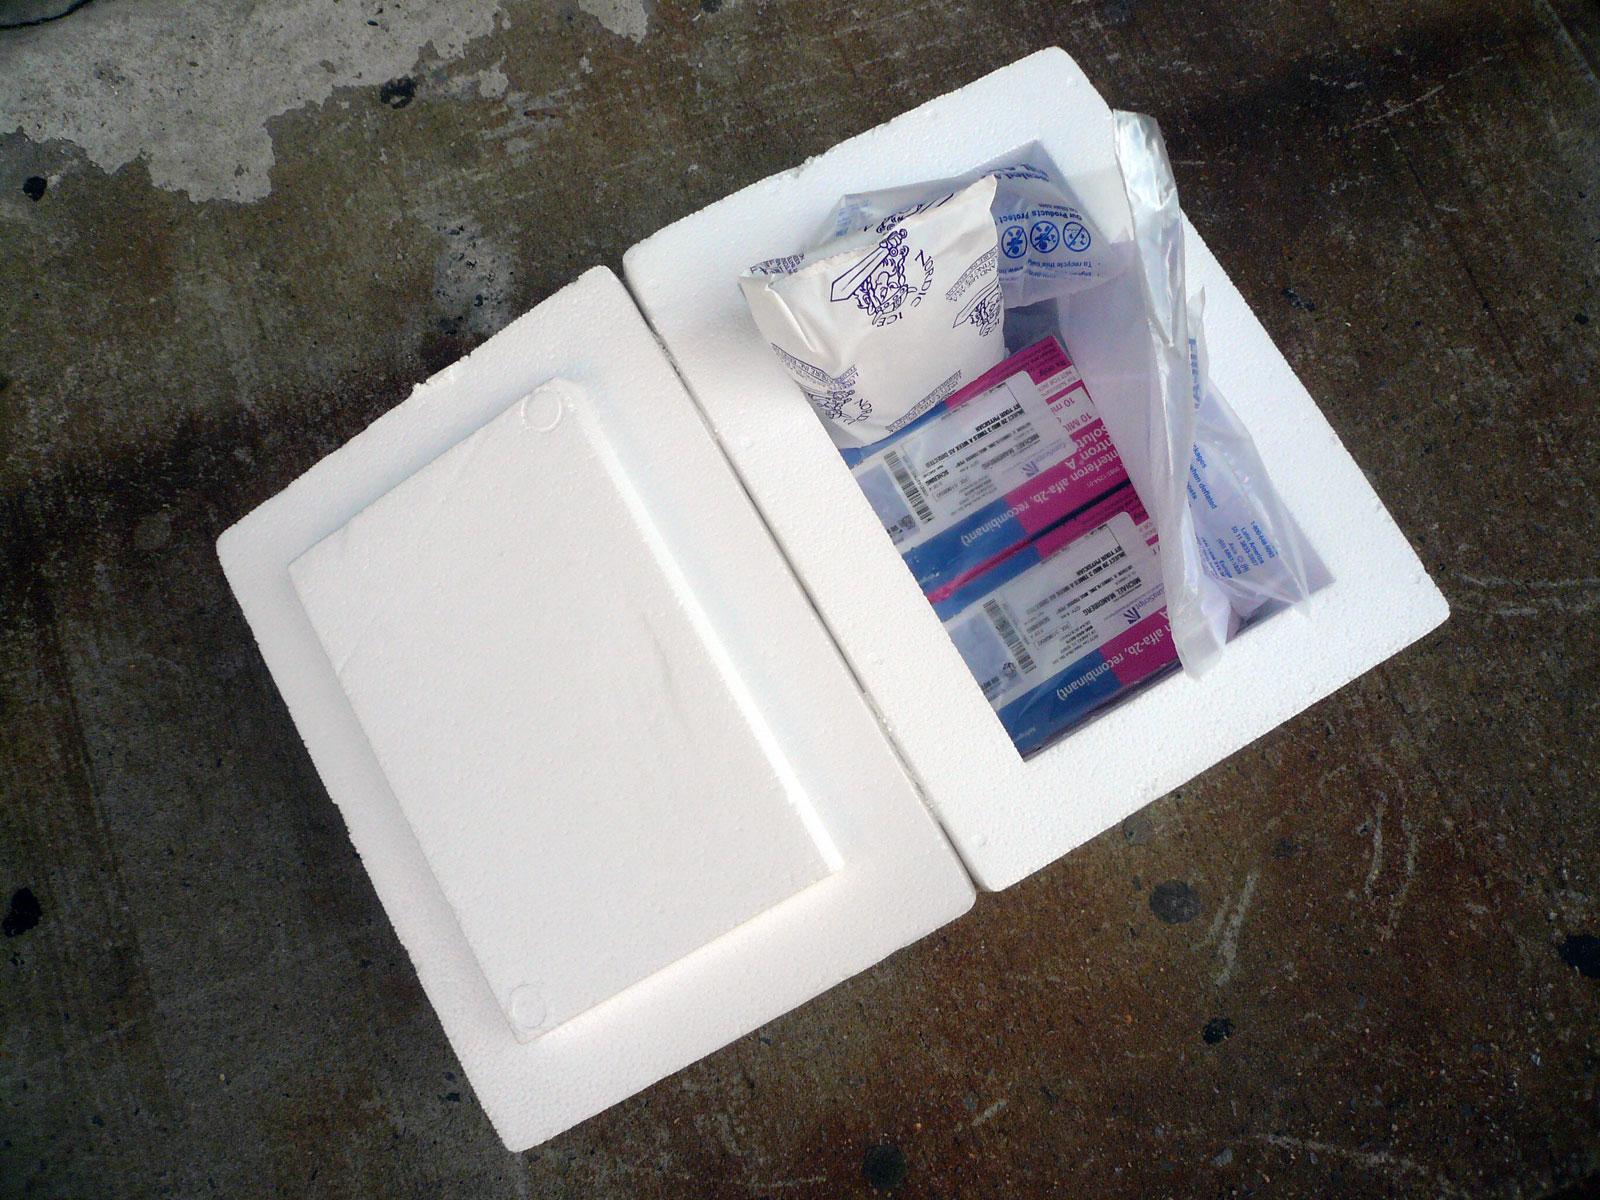 interferon shipping box